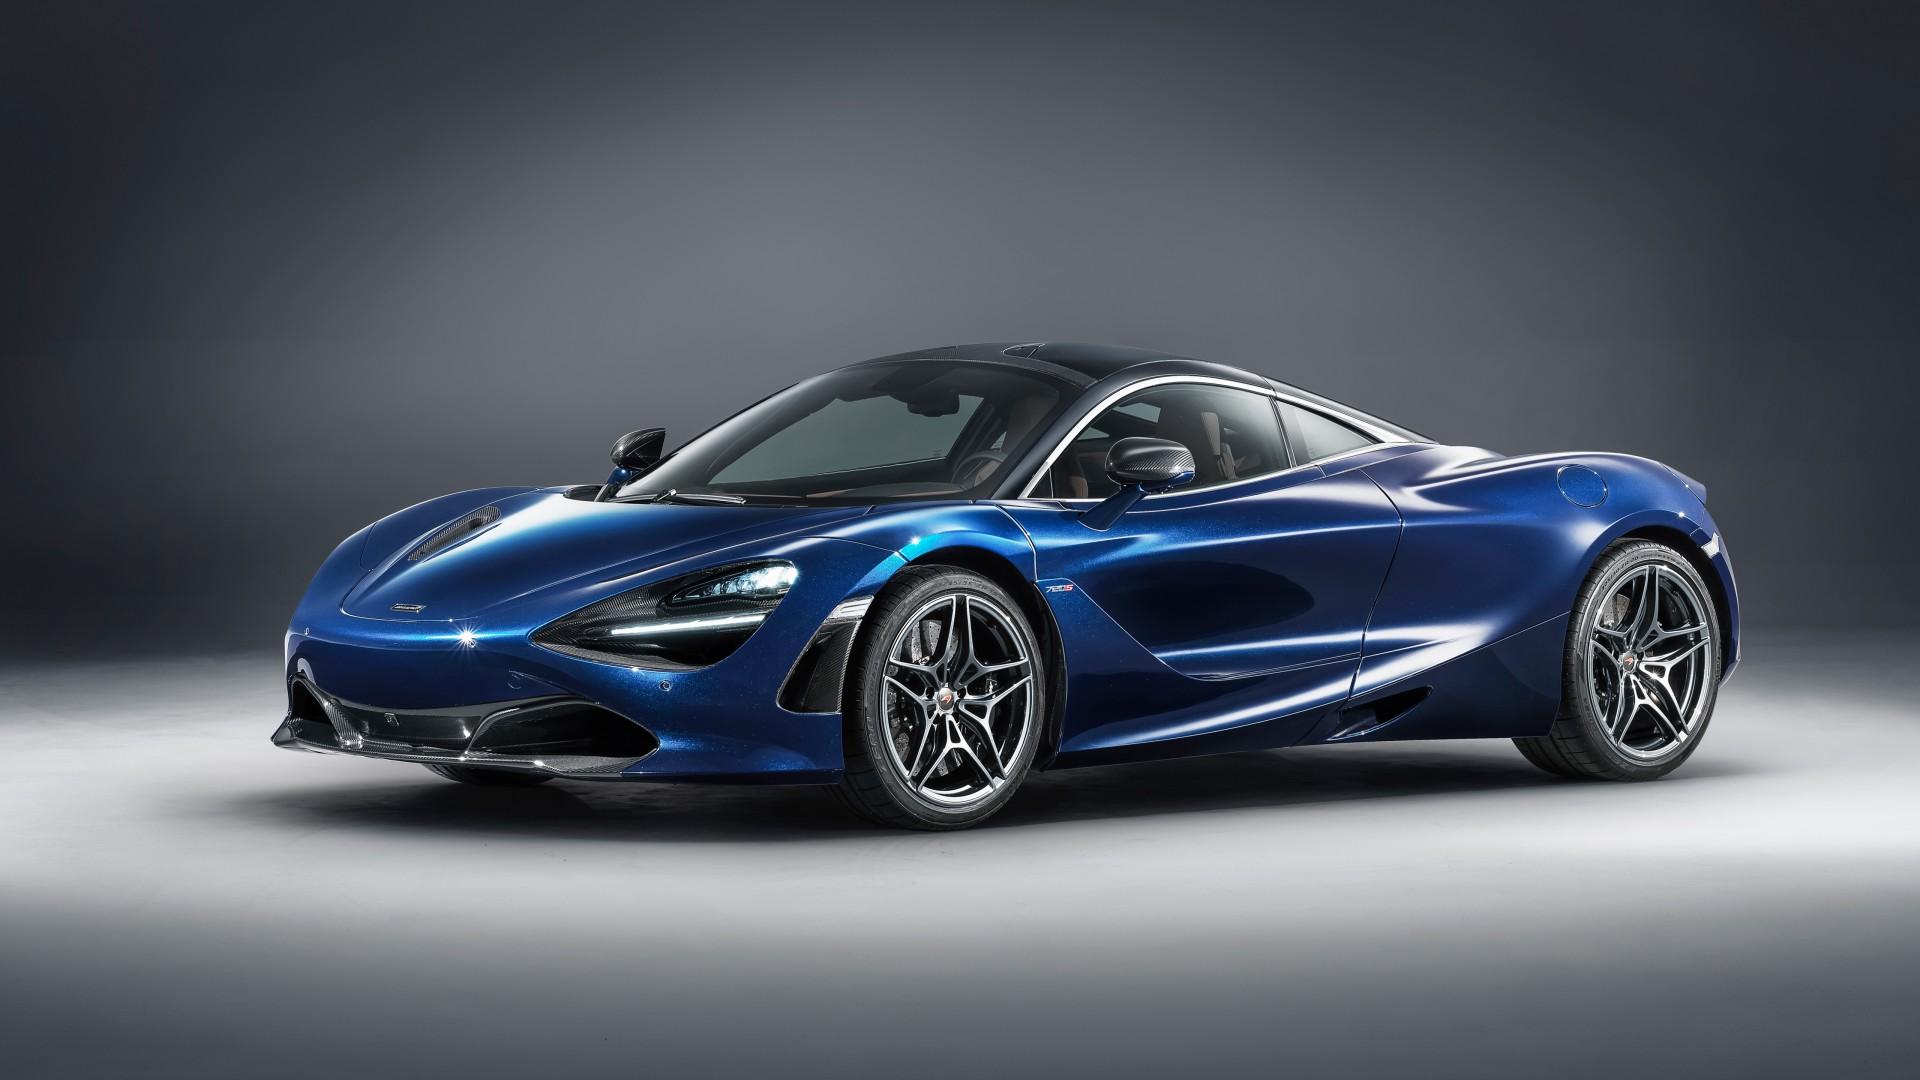 Car Wallpaper Windows 7 2018 Mso Mclaren 720s Atlantic Blue 5k Wallpaper Hd Car